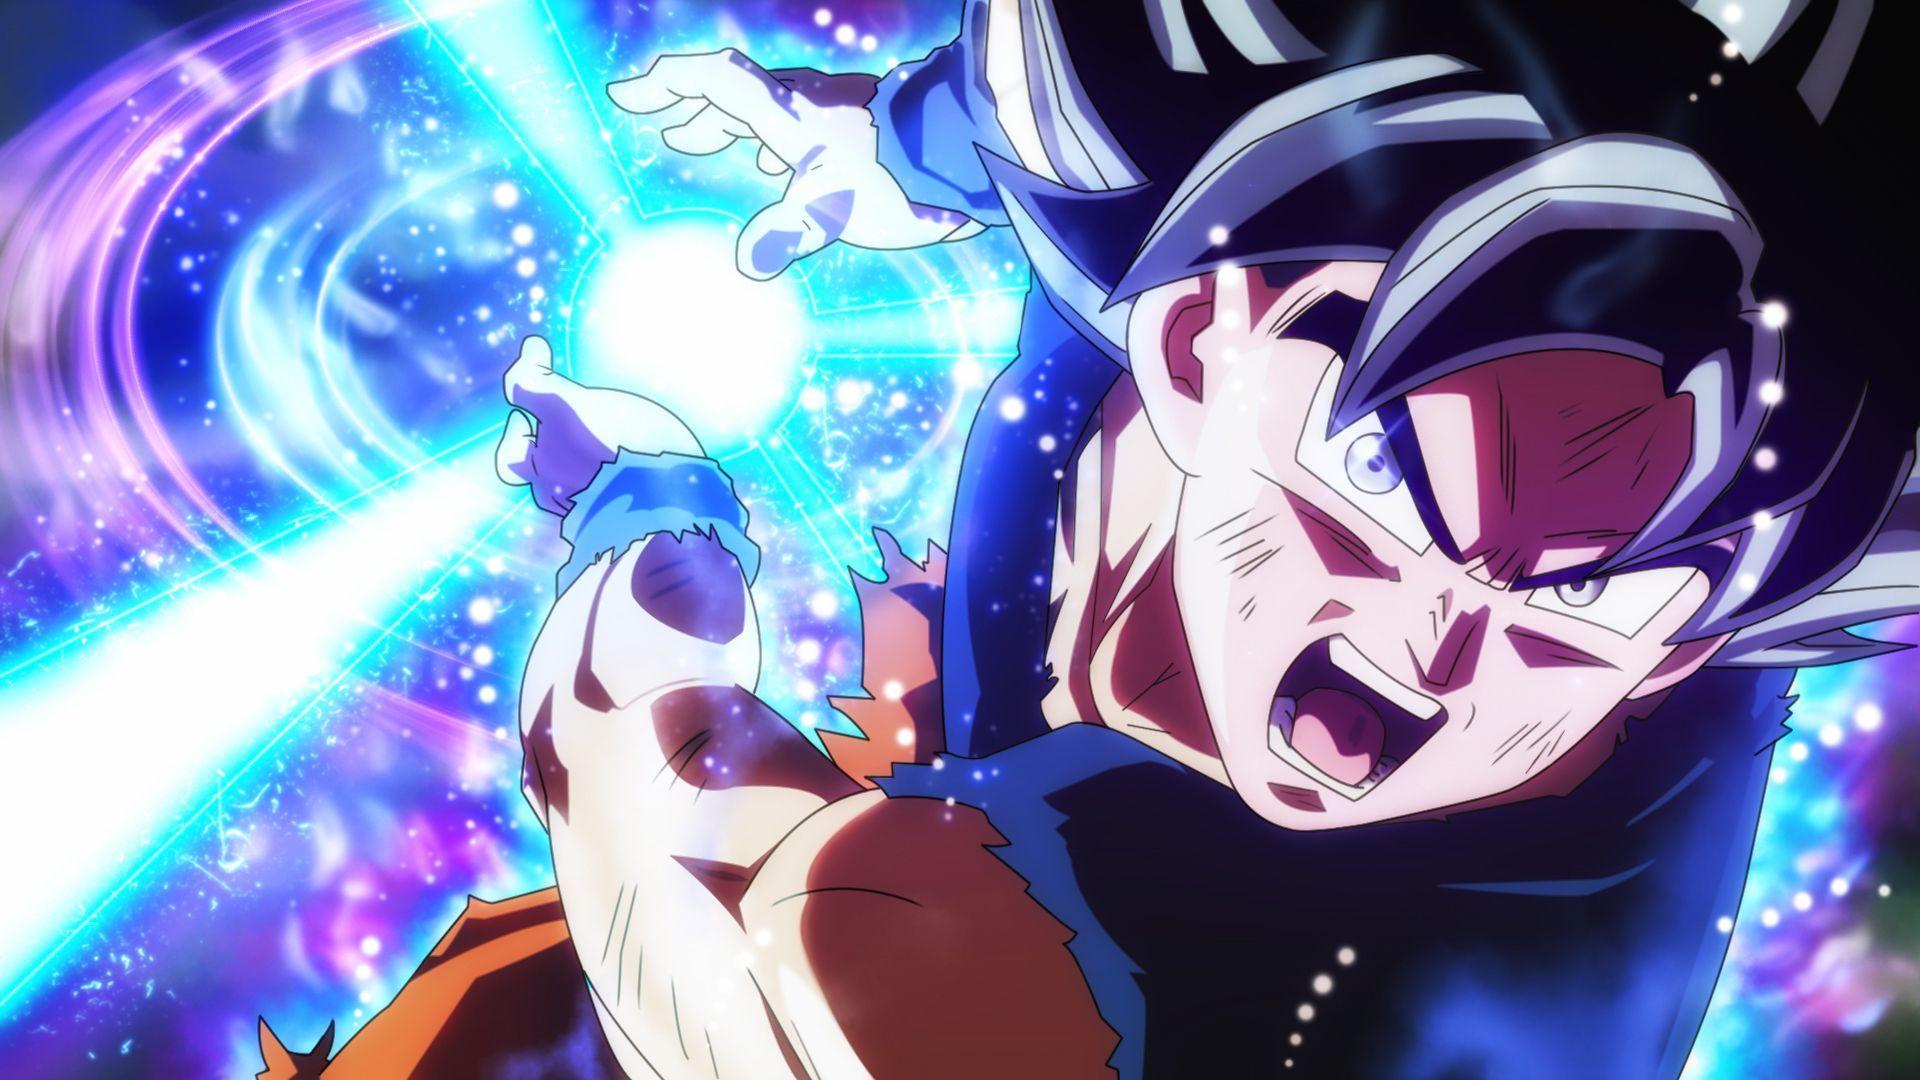 1920x1080 Ultra Instinct Goku Vs Kefla Universal Kamehameha Full